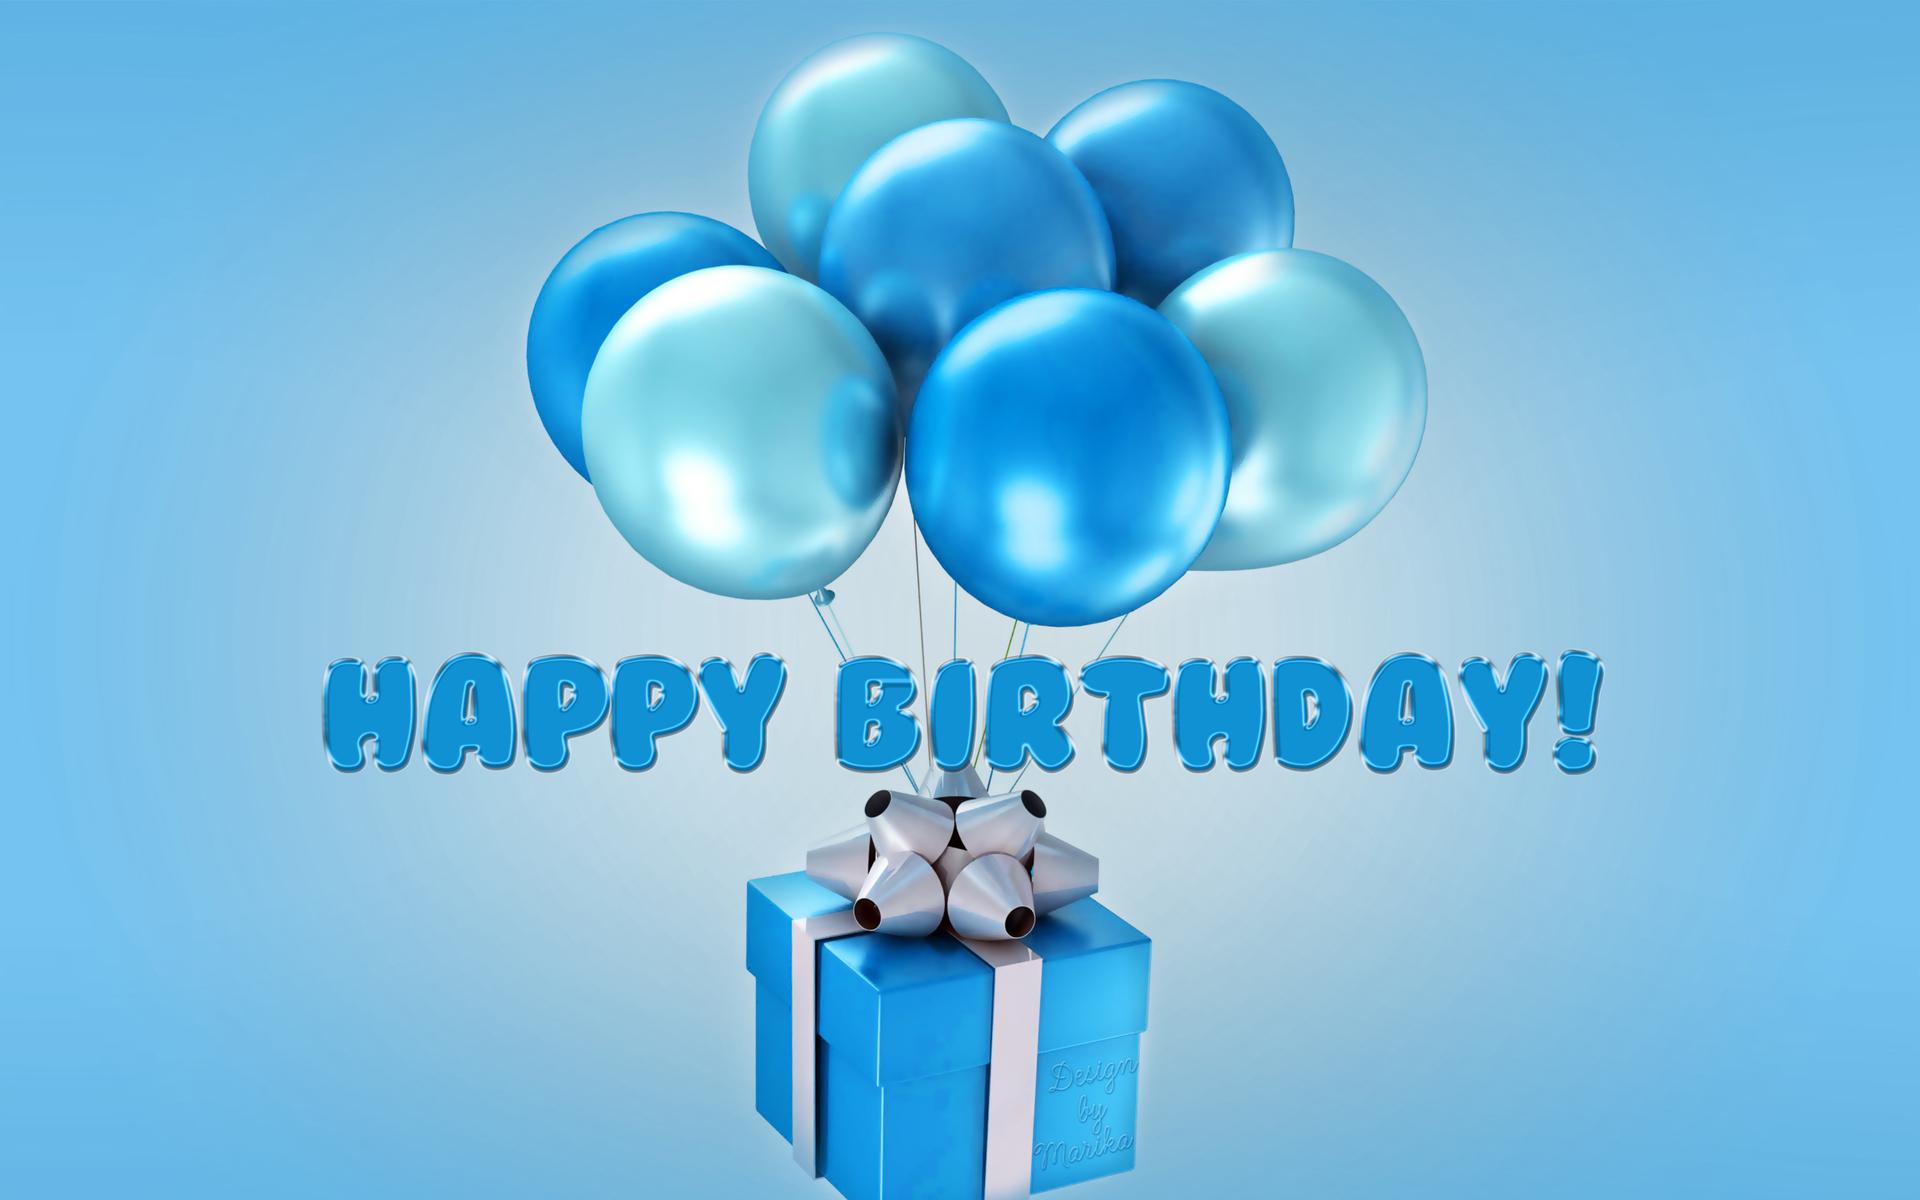 happy birthday images free - happy birthday images free - Wallpapers, hd-wallpapers, HD, Free, Birthday, 4k-wallpapers, 4k